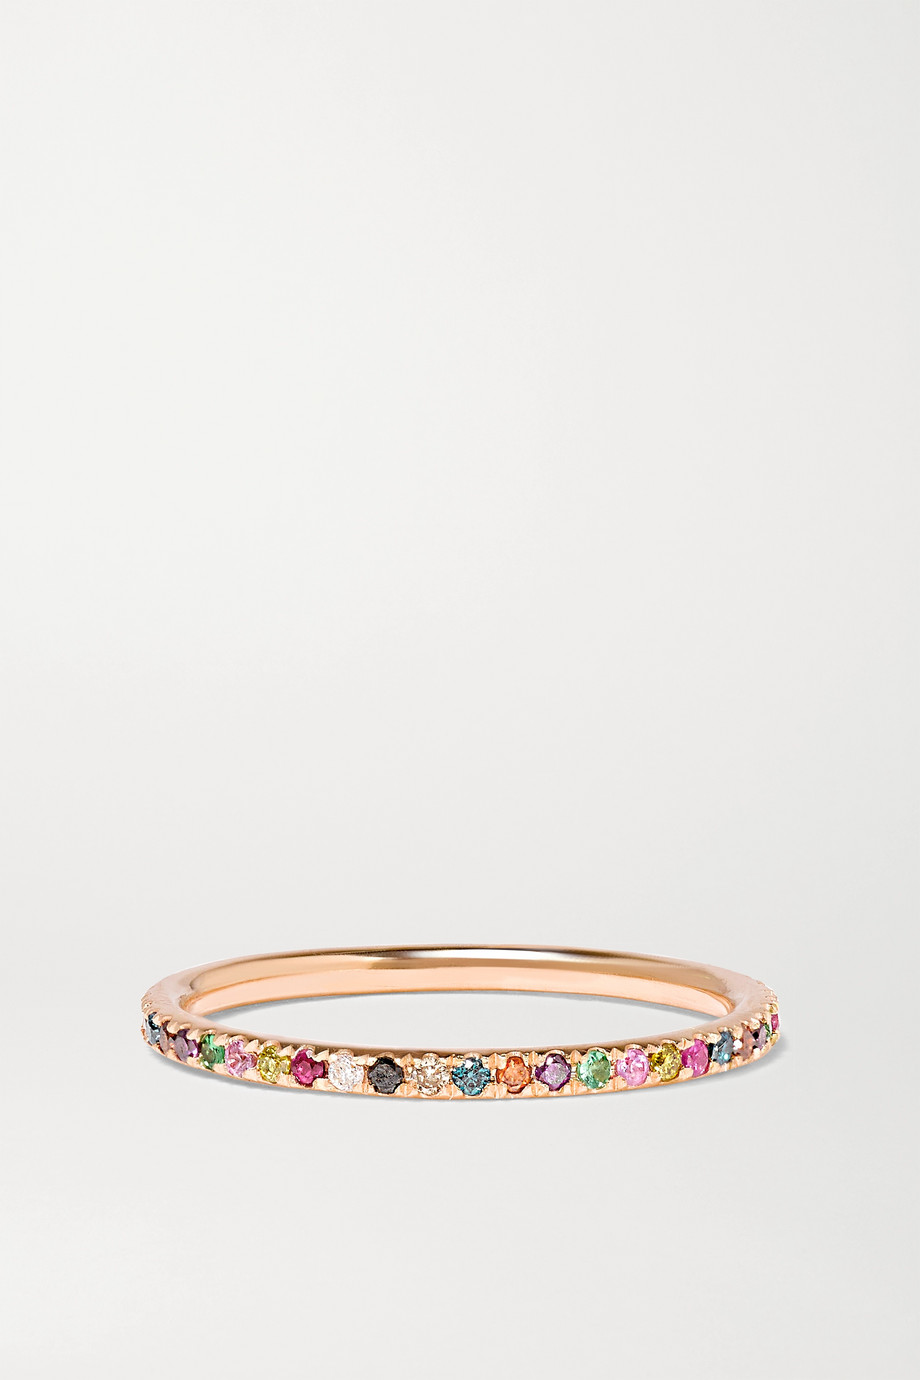 Ileana Makri Thread 18-karat rose gold multi-stone ring